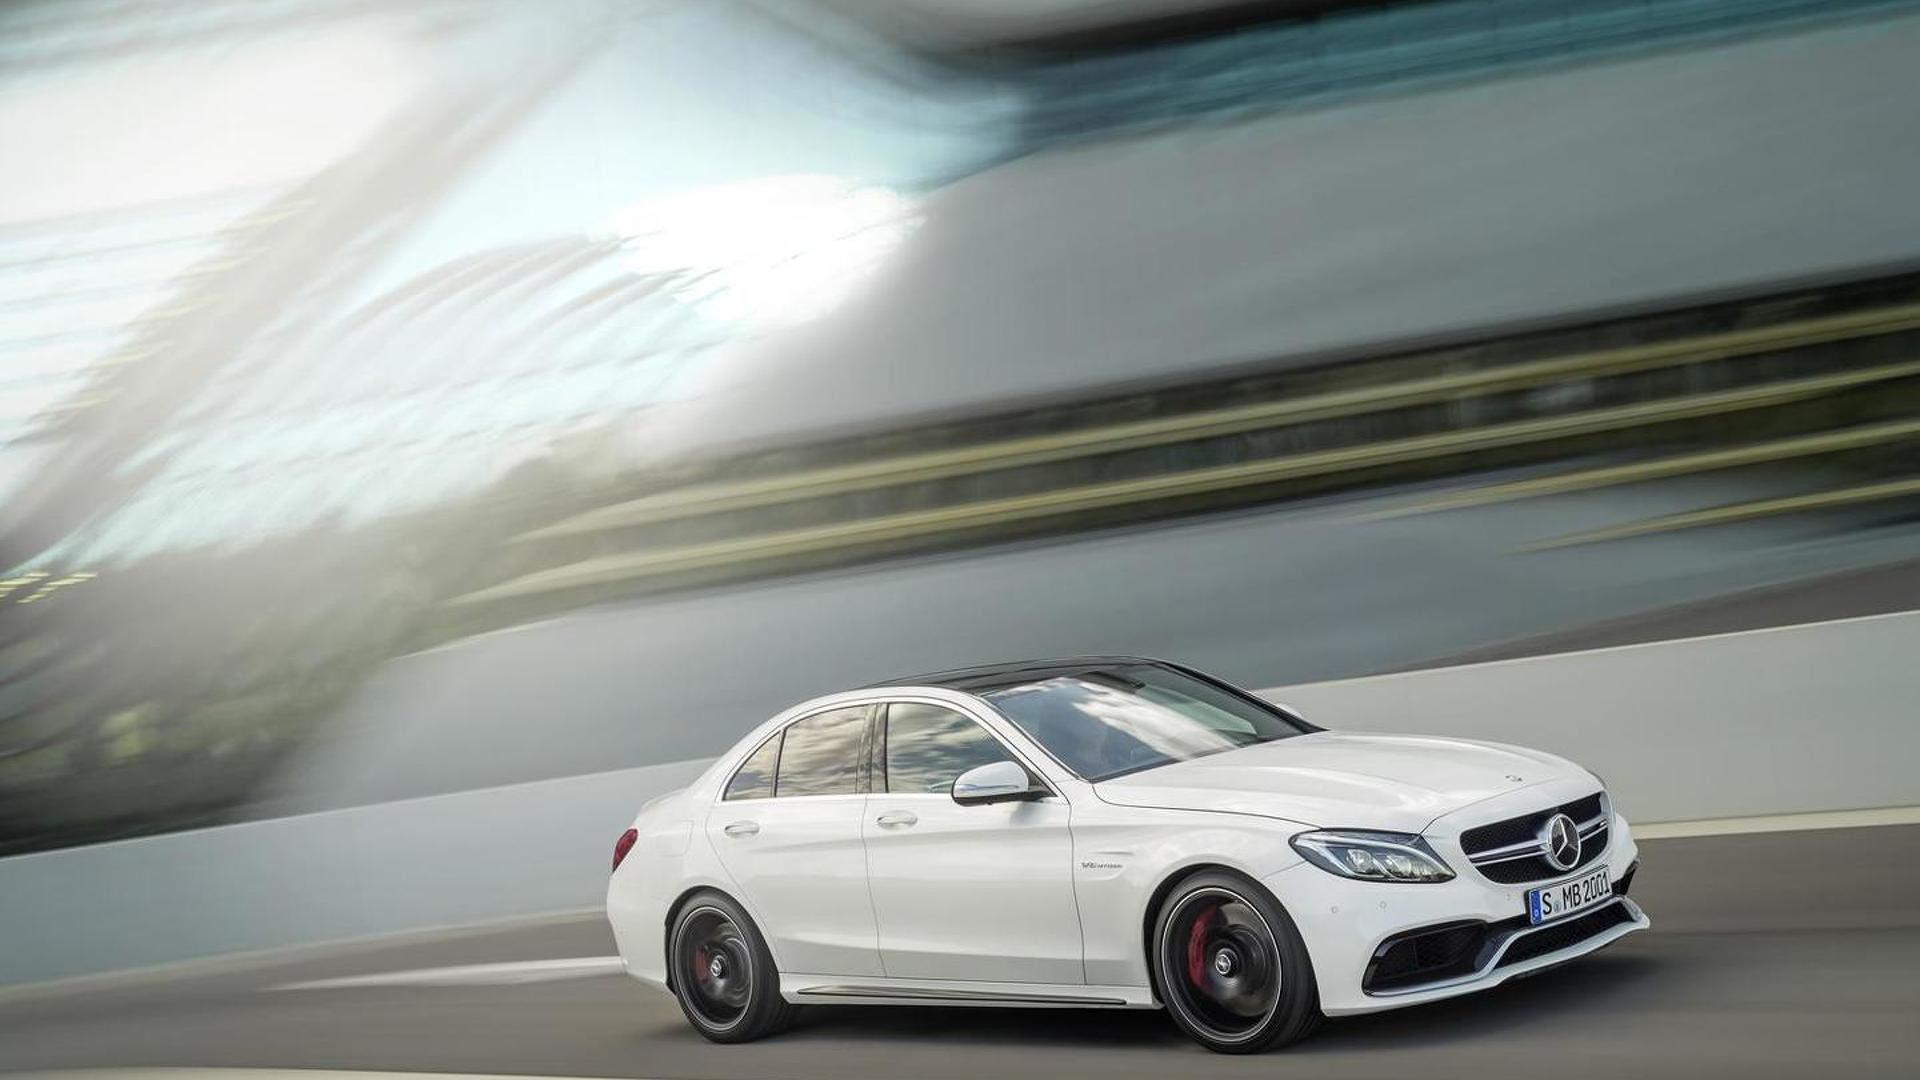 Mercedes C63 AMG pricing announced (US)